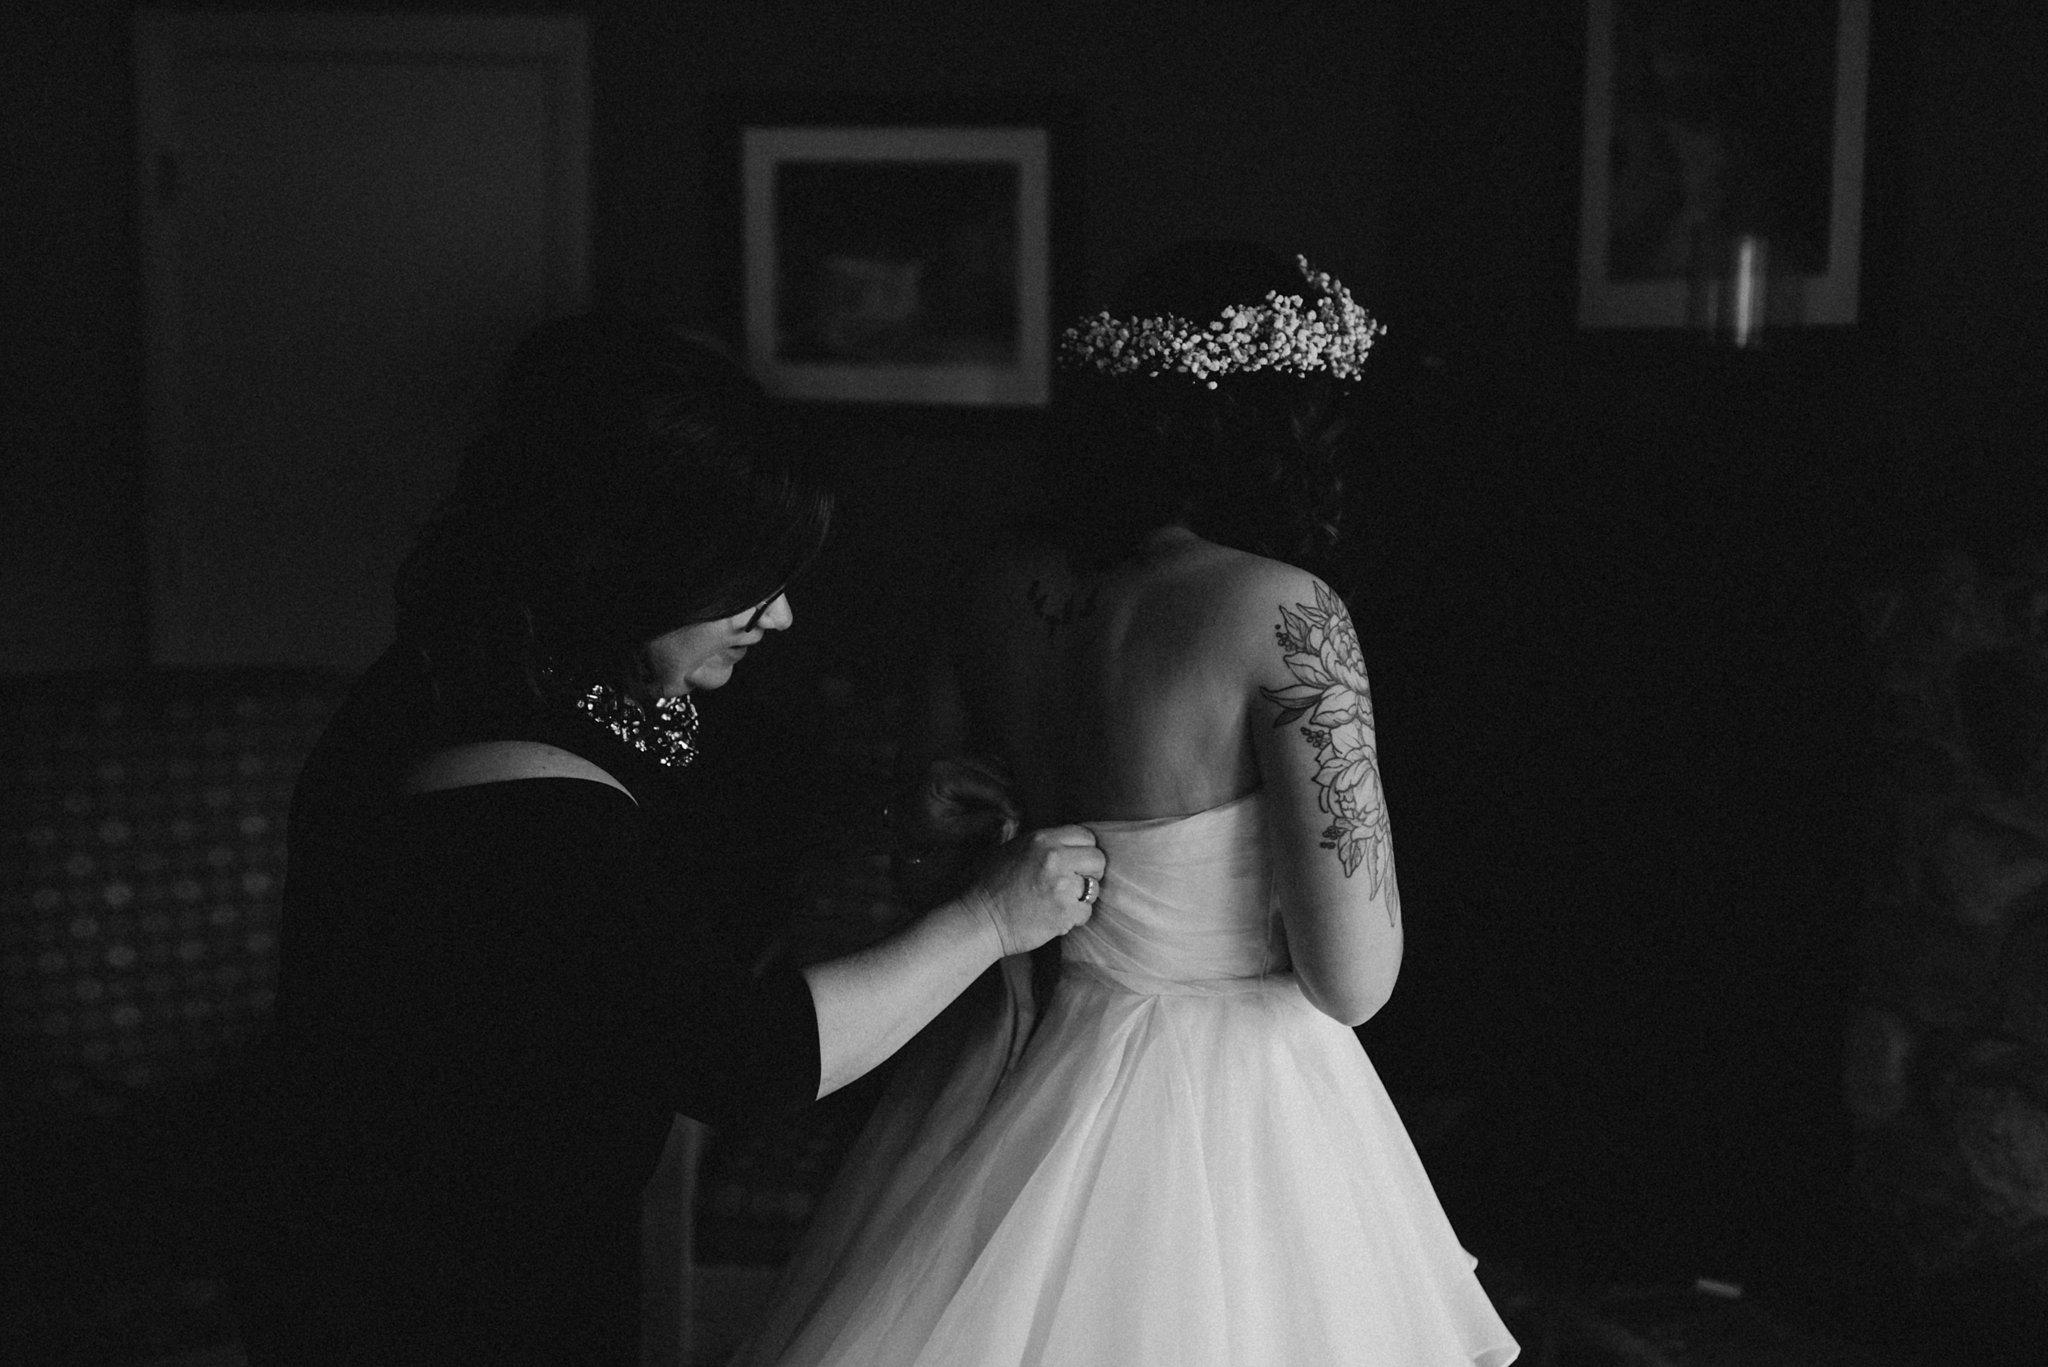 kaihla_tonai_intimate_wedding_elopement_photographer_6879.jpg